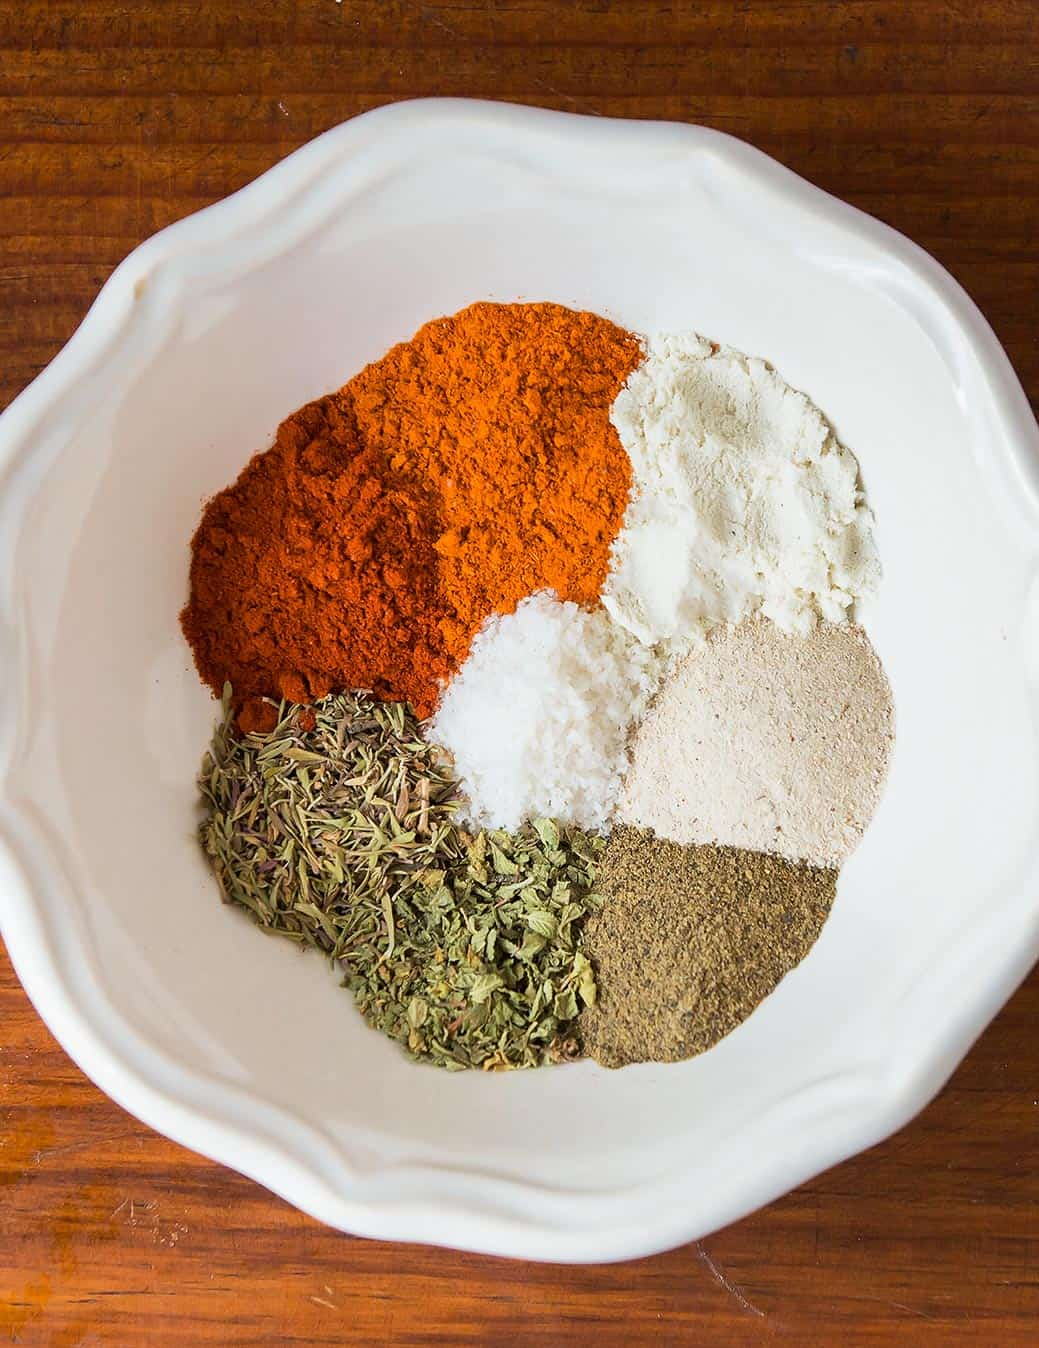 Cajun Spice Mix in Bowl